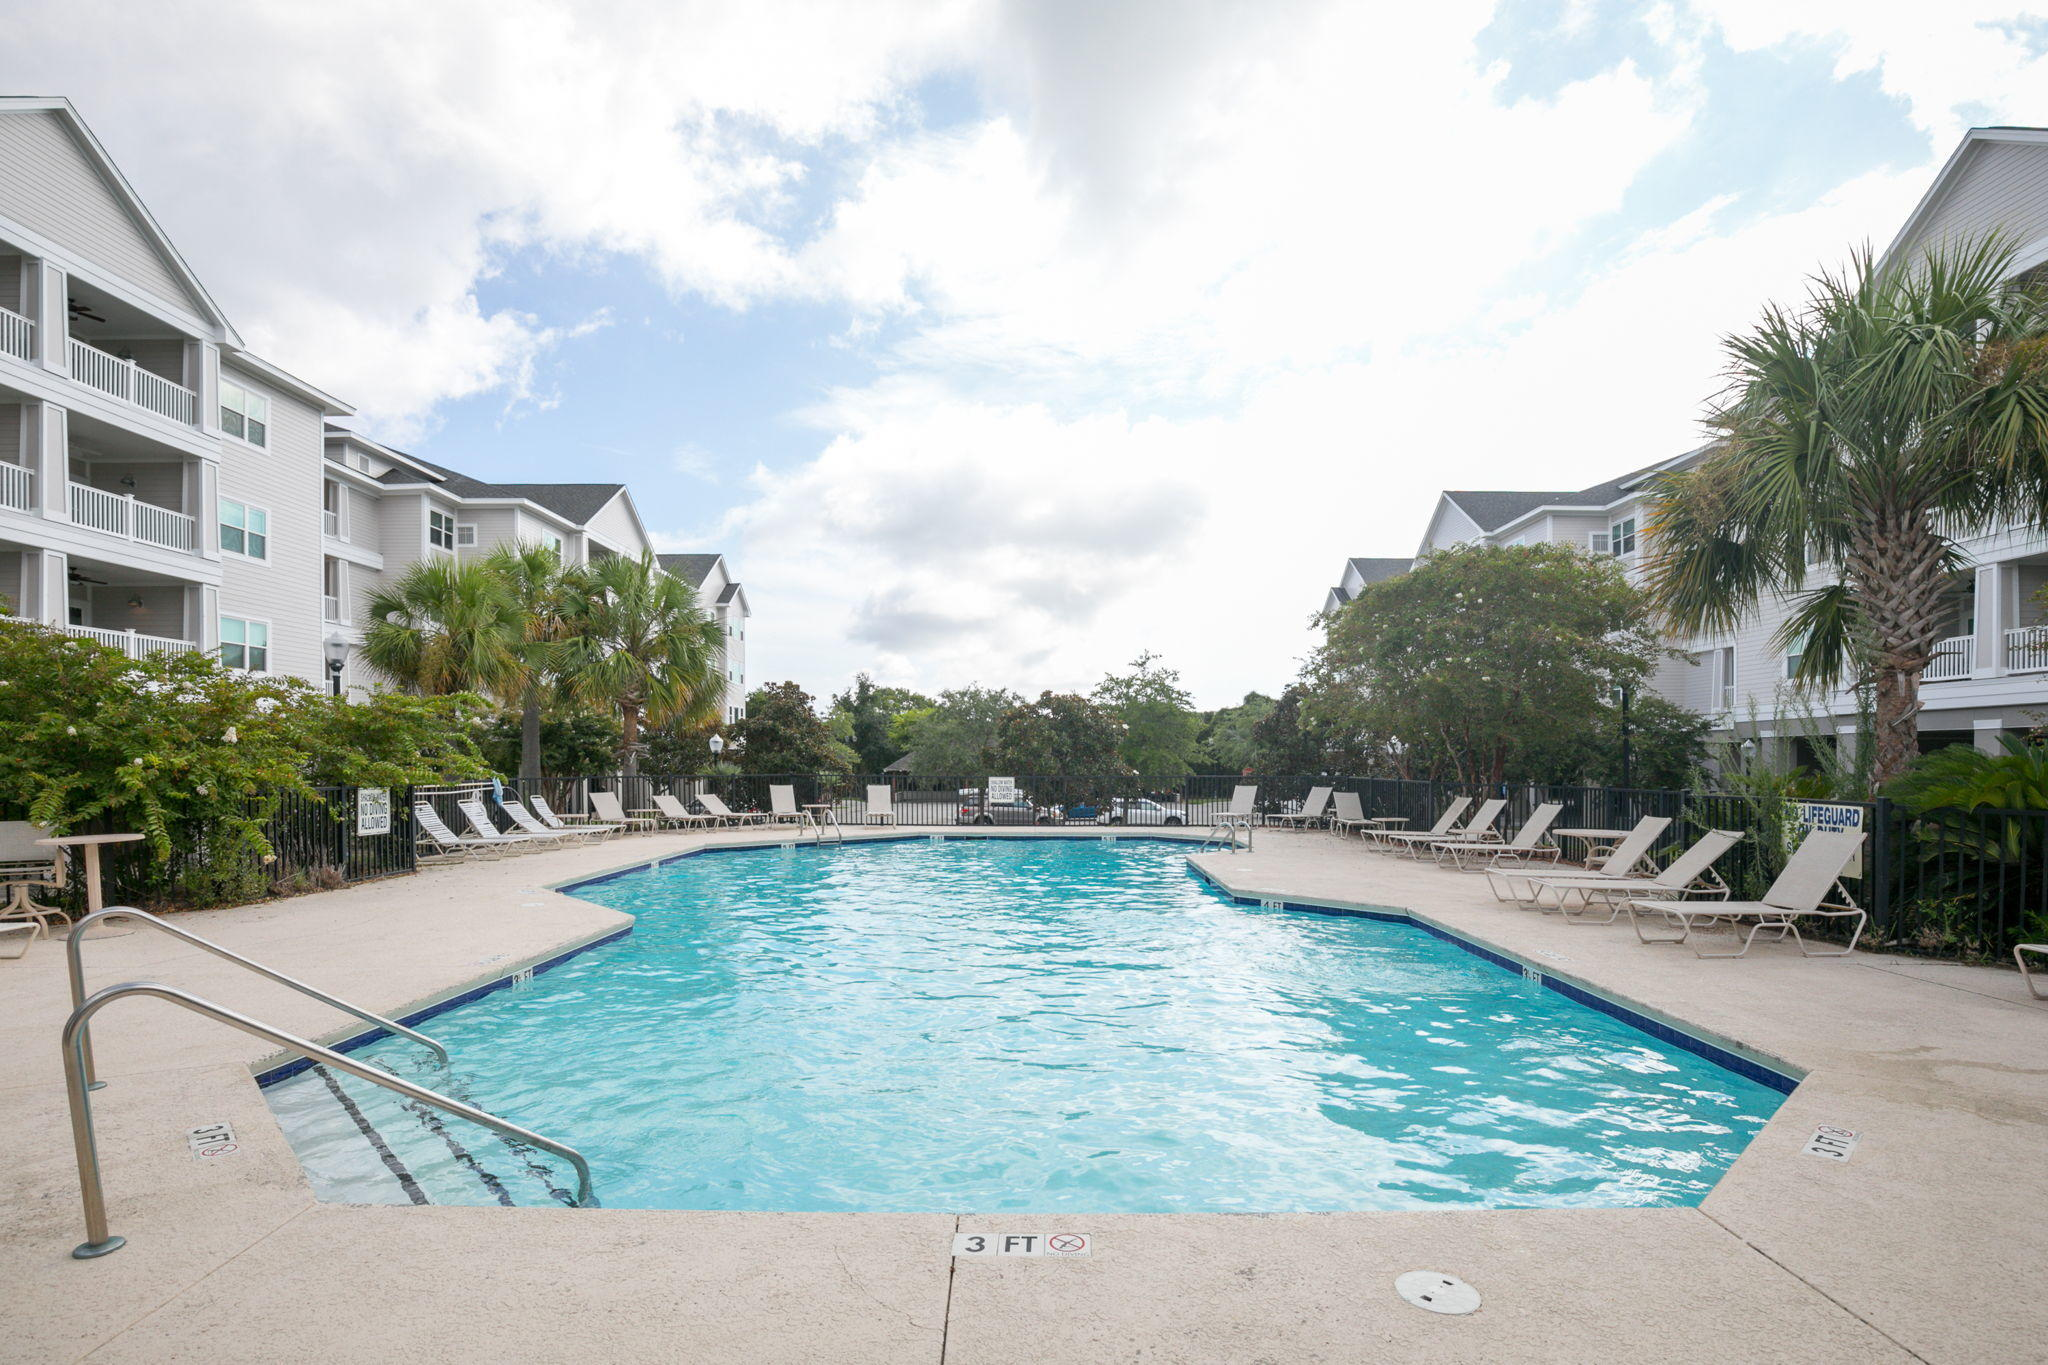 Pelican Pointe Villas Homes For Sale - 1984 Folly, Charleston, SC - 2